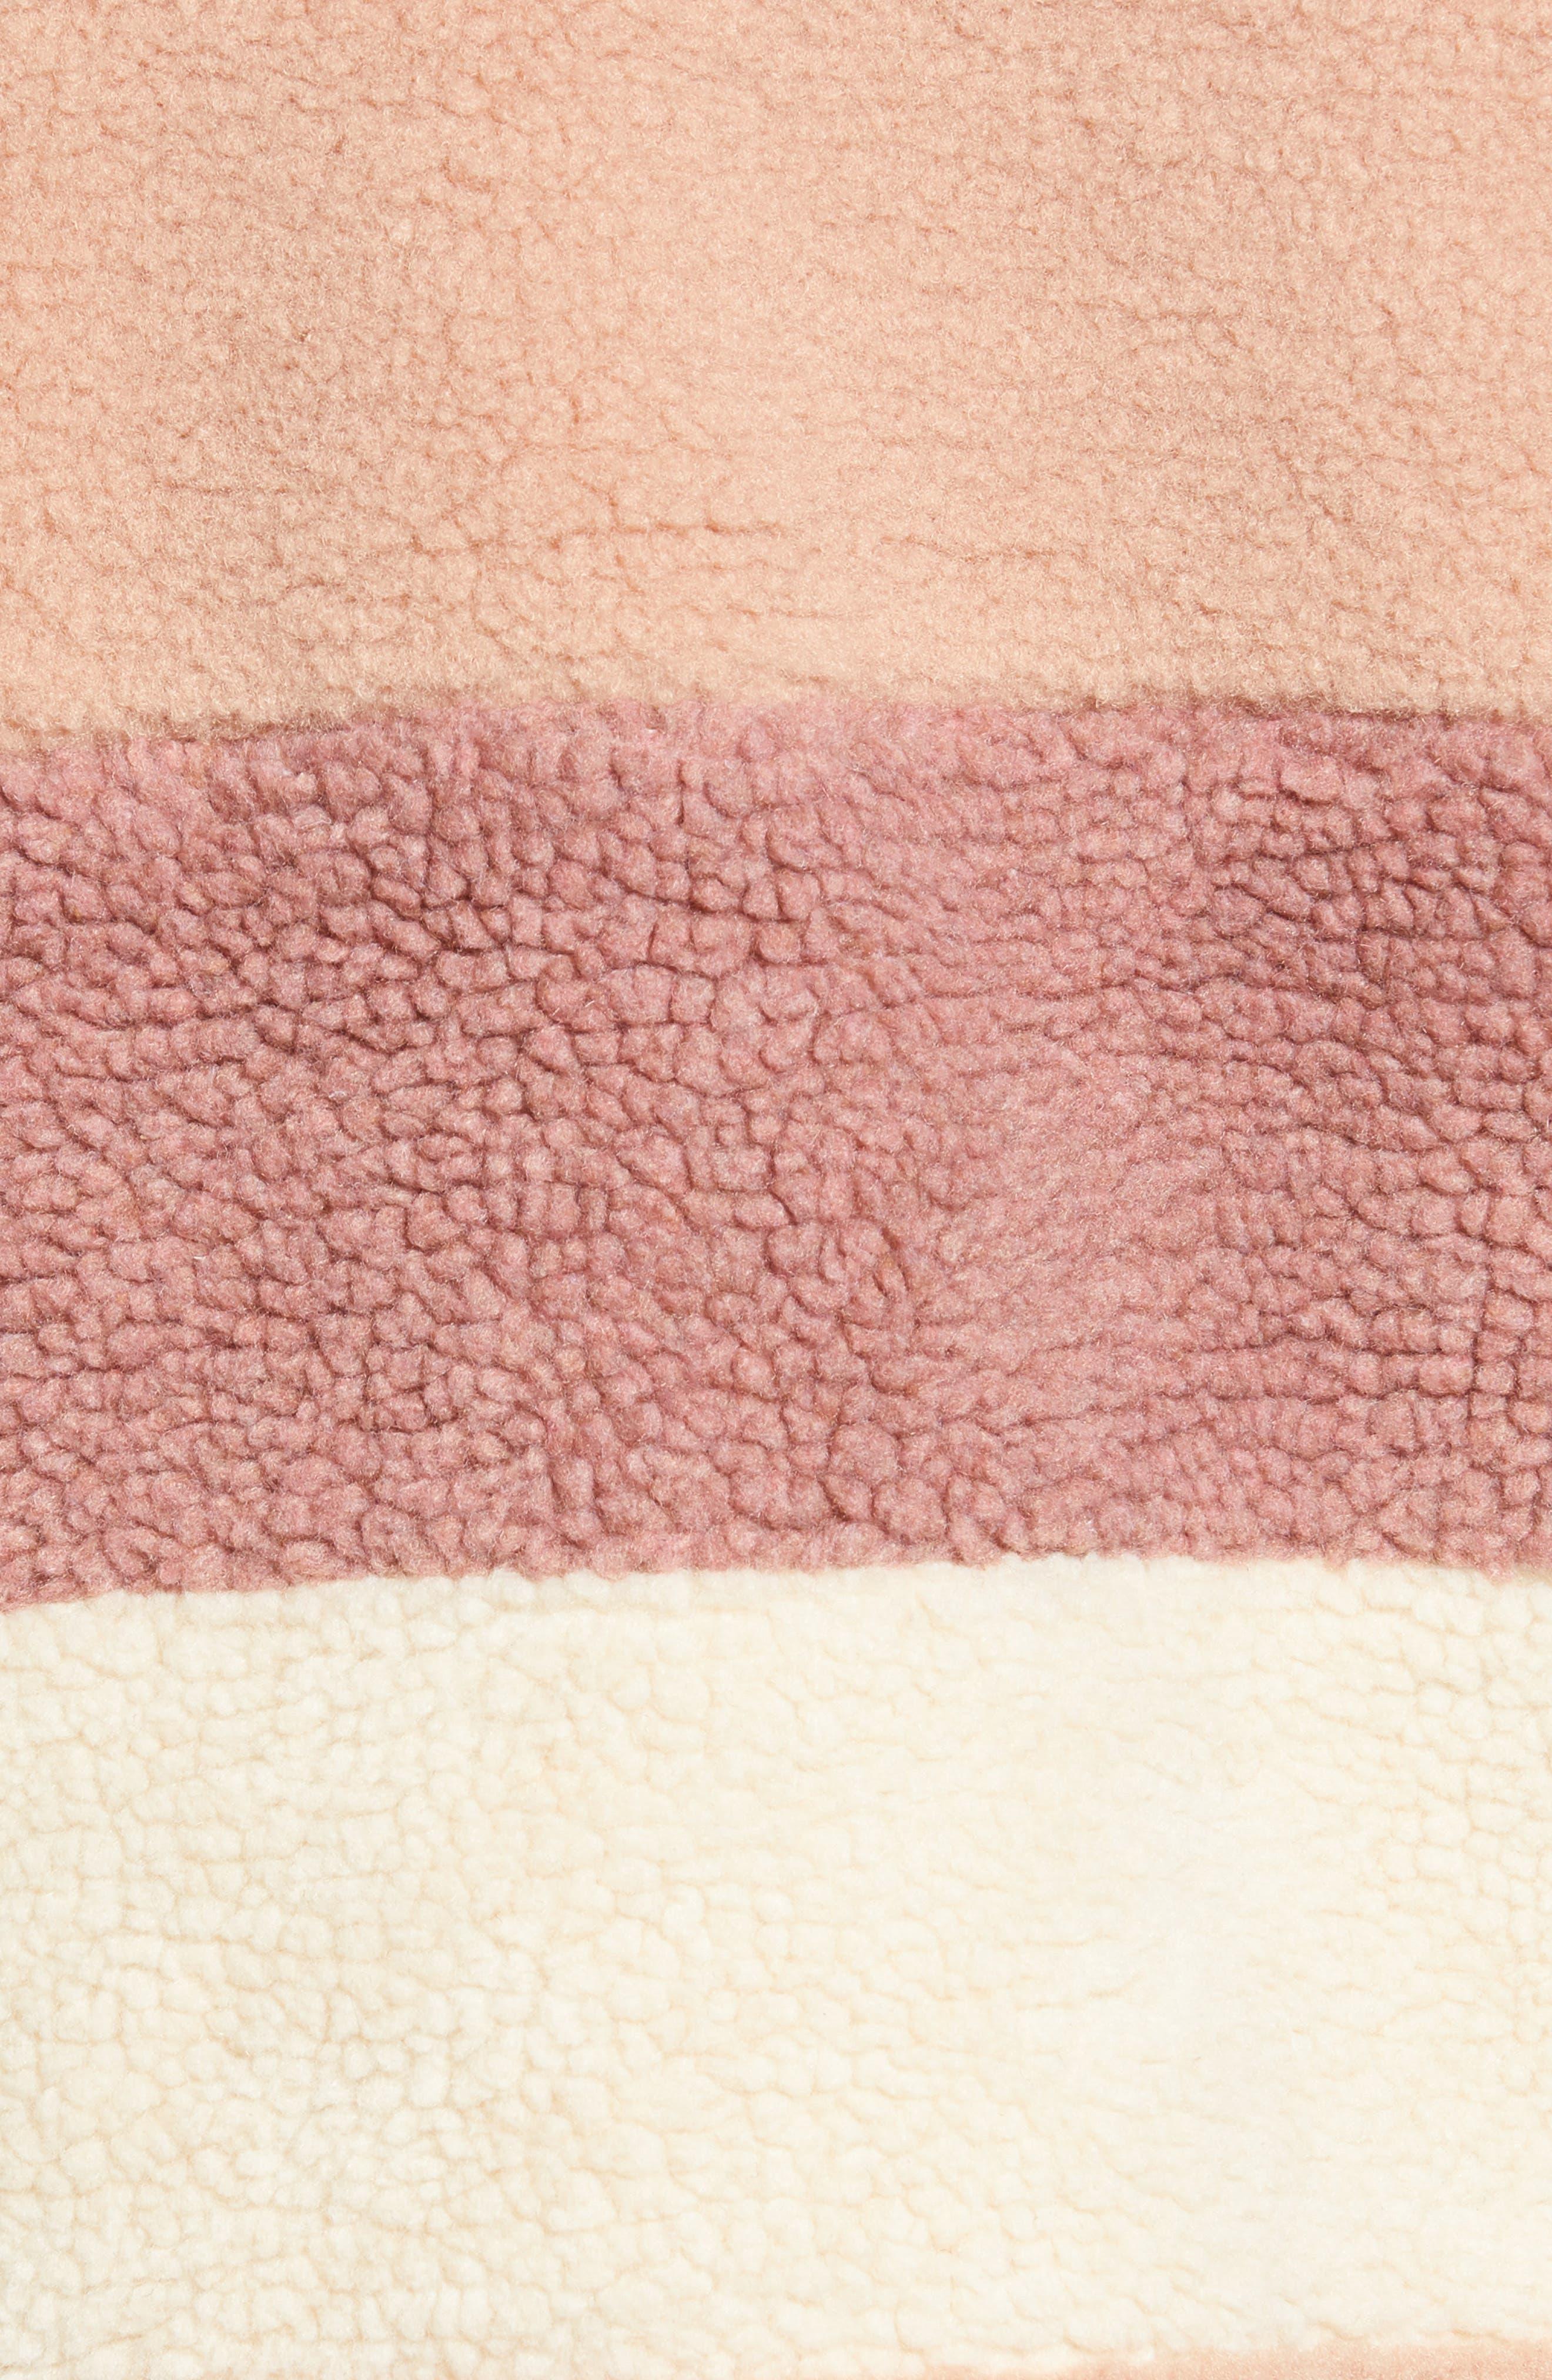 Stripe Faux Shearling Jacket,                             Alternate thumbnail 7, color,                             IVORY EGRET MUTLI STRIPE